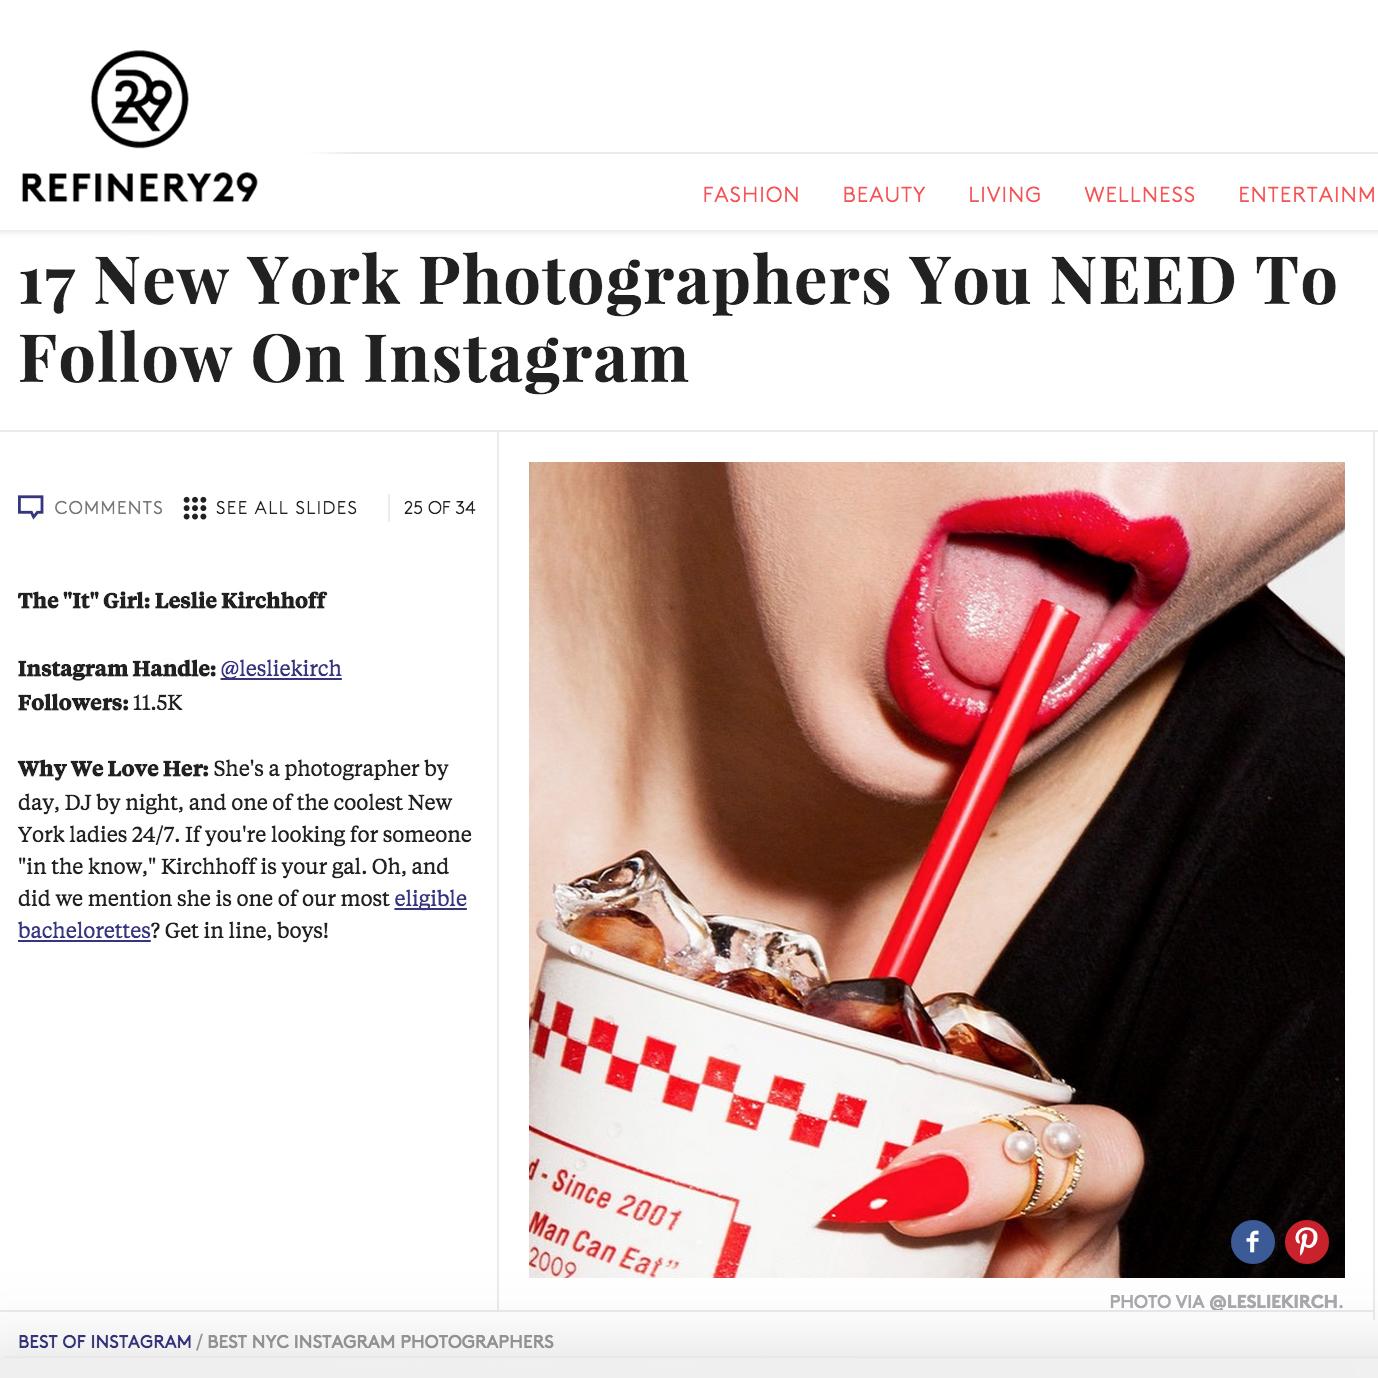 http://www.refinery29.com/best-nyc-instagram-photographers#slide-25